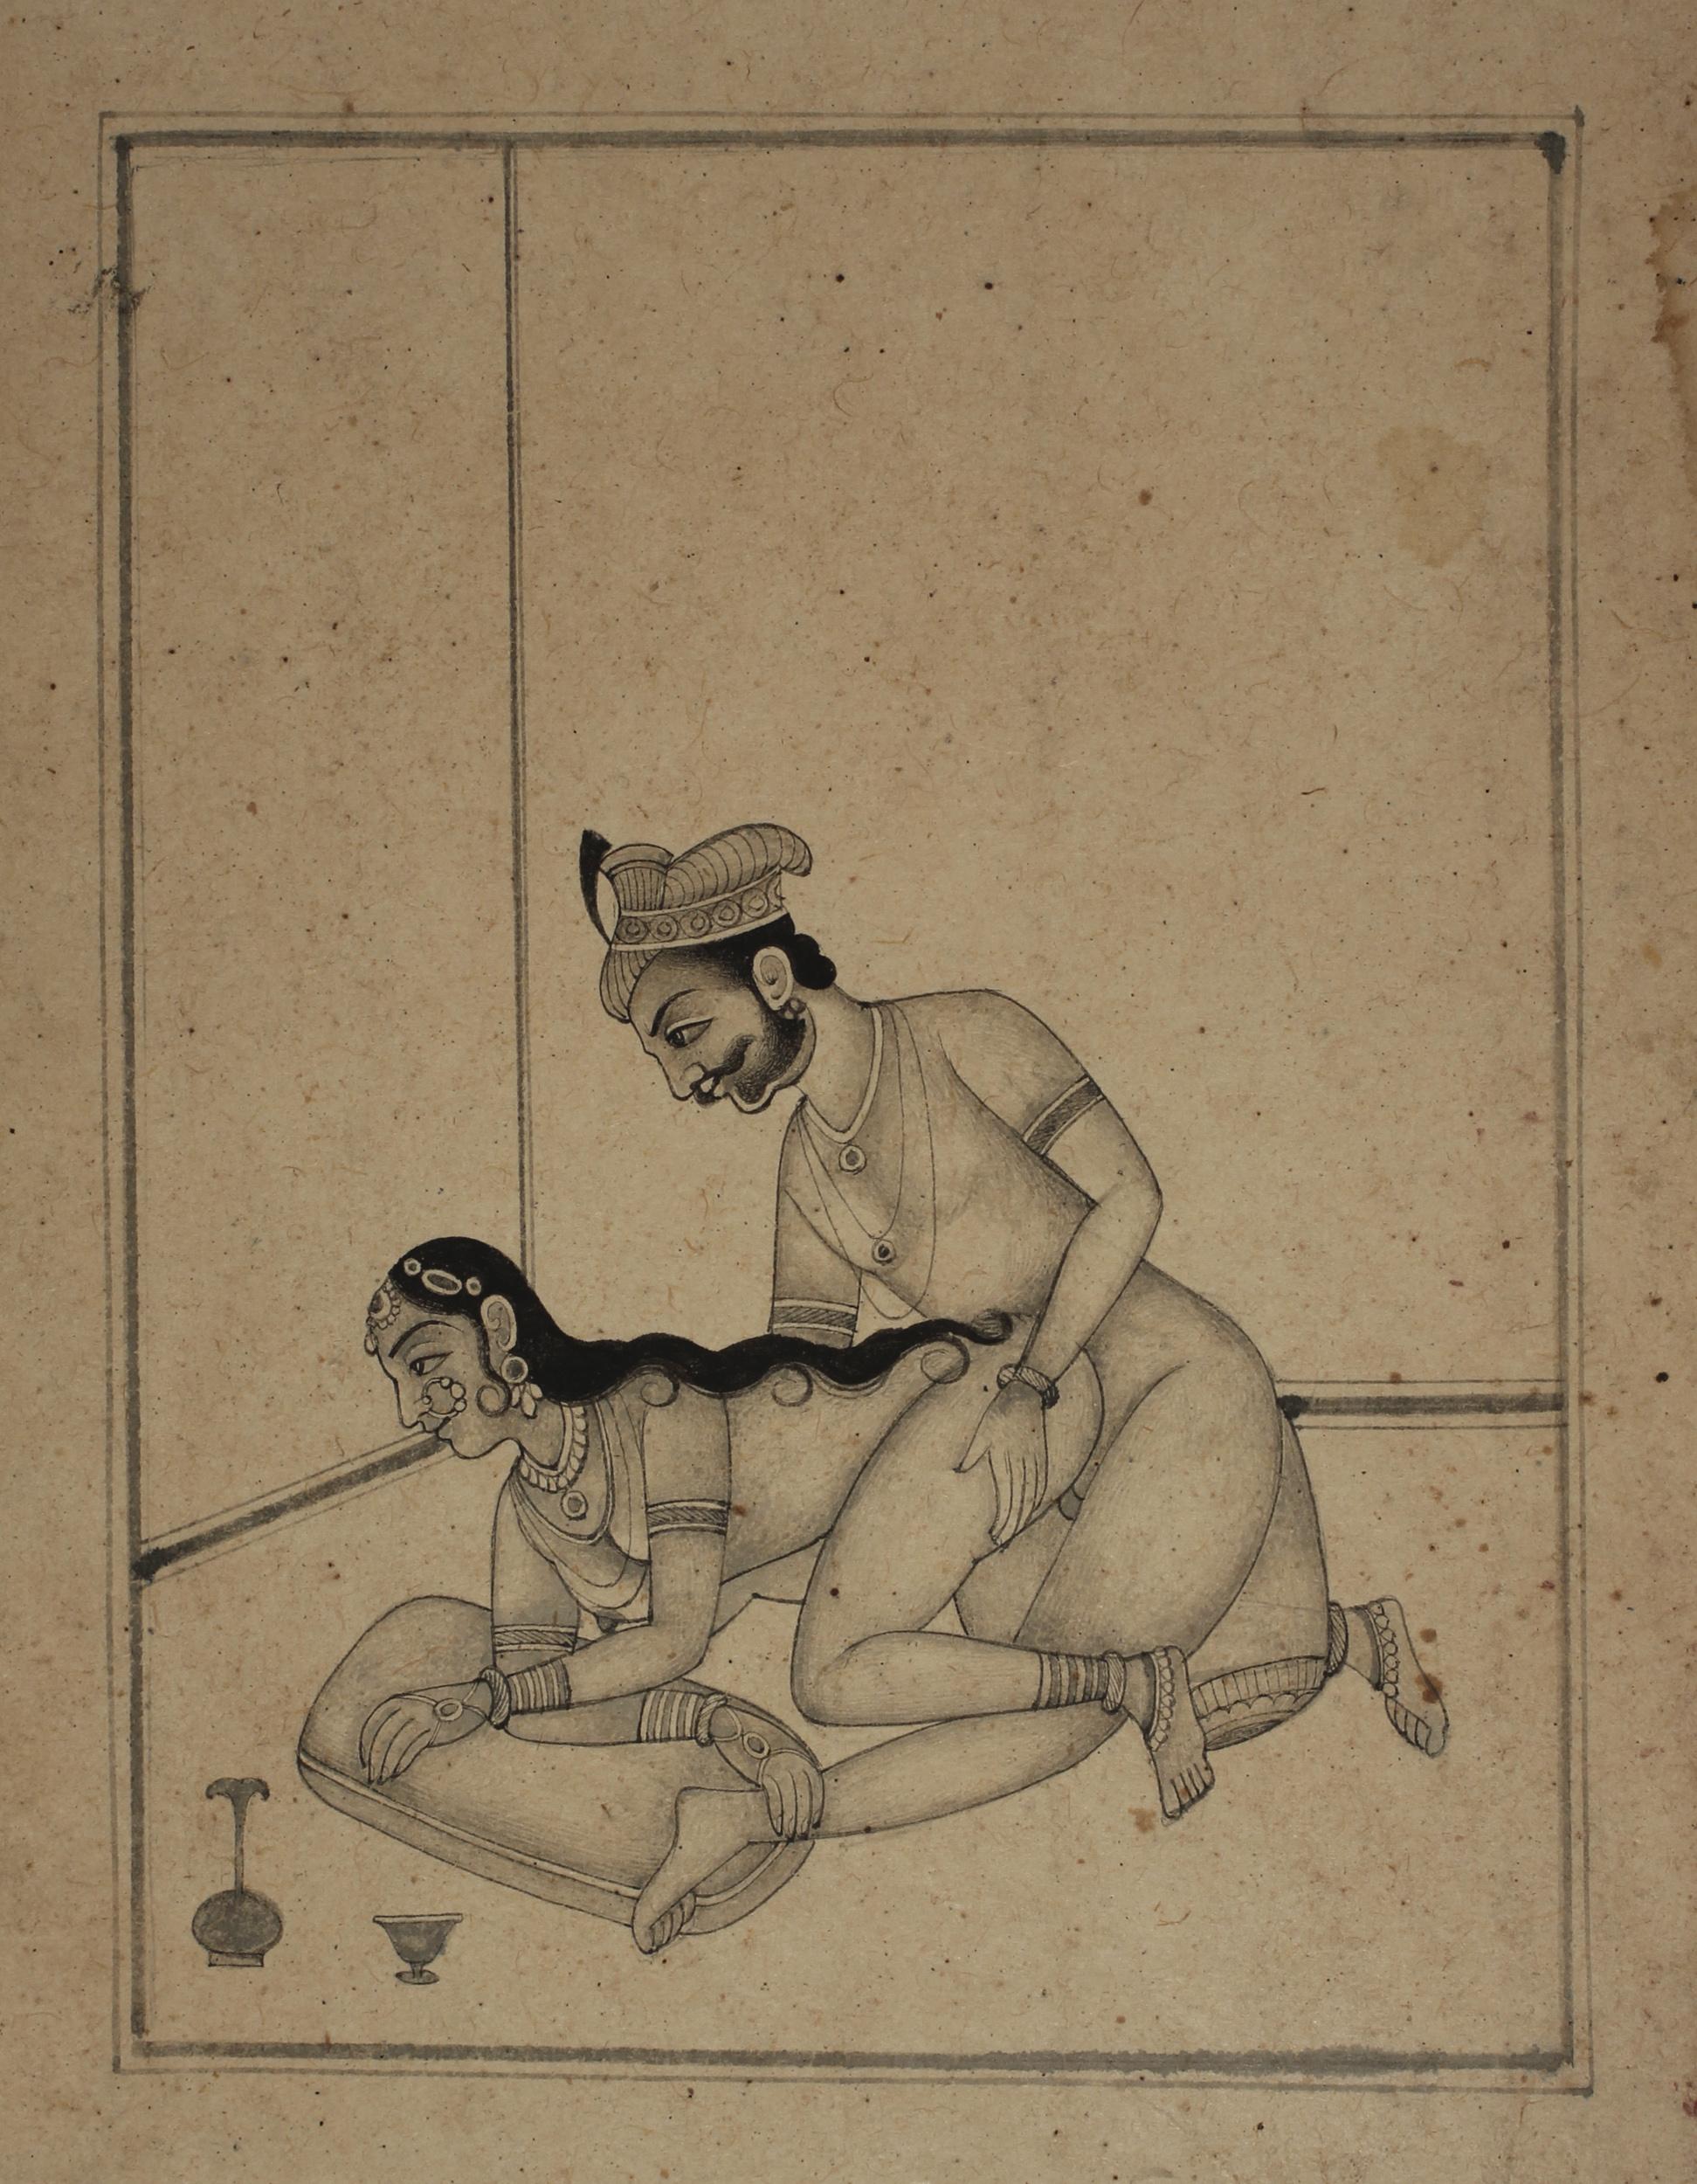 anonym - Erotic drawing